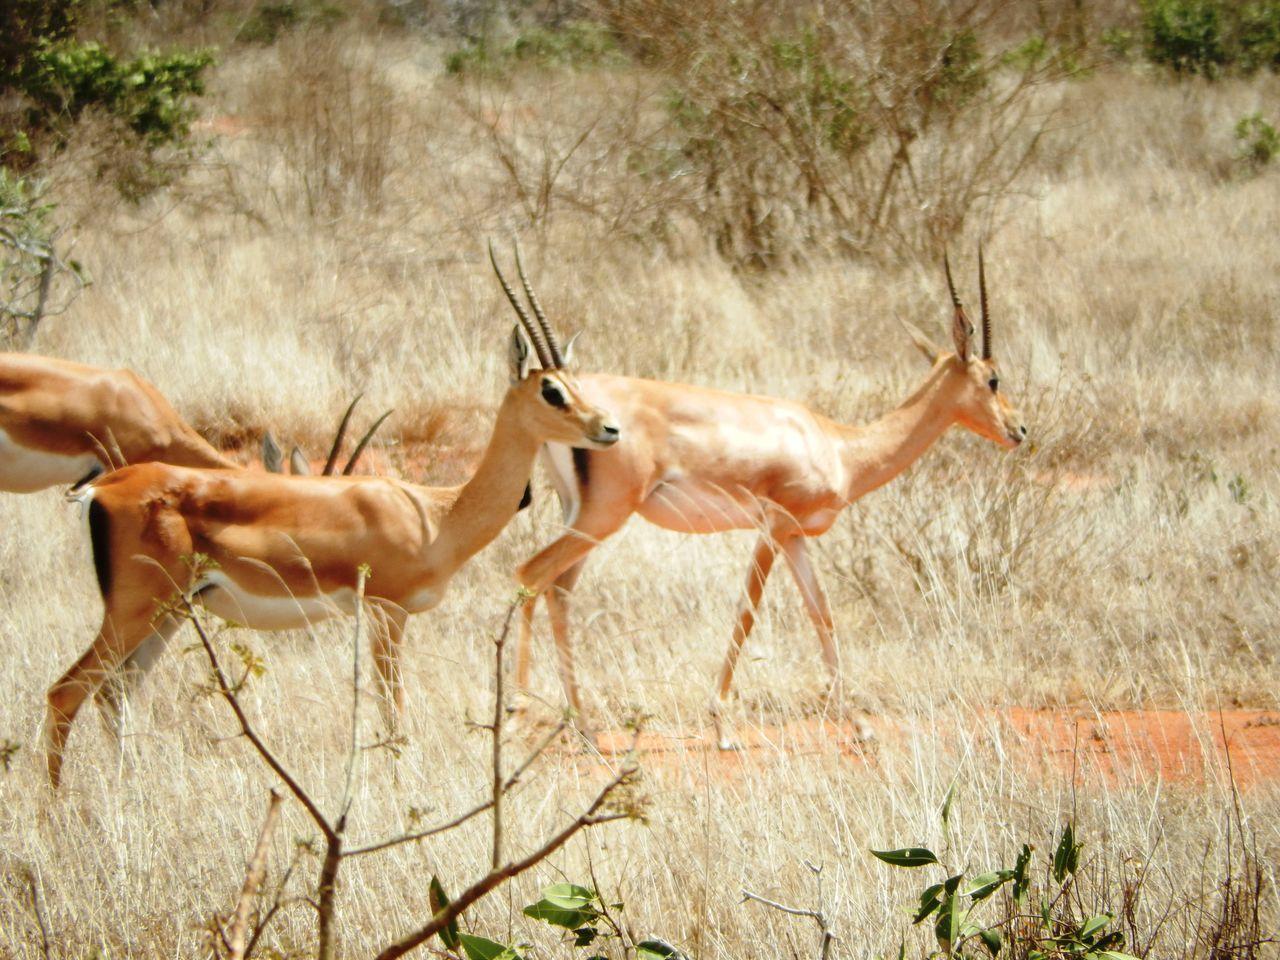 Africa Animal Themes Antilope Kenya Nationalpark Nature Safari Travel Travel Destinations Tsavo